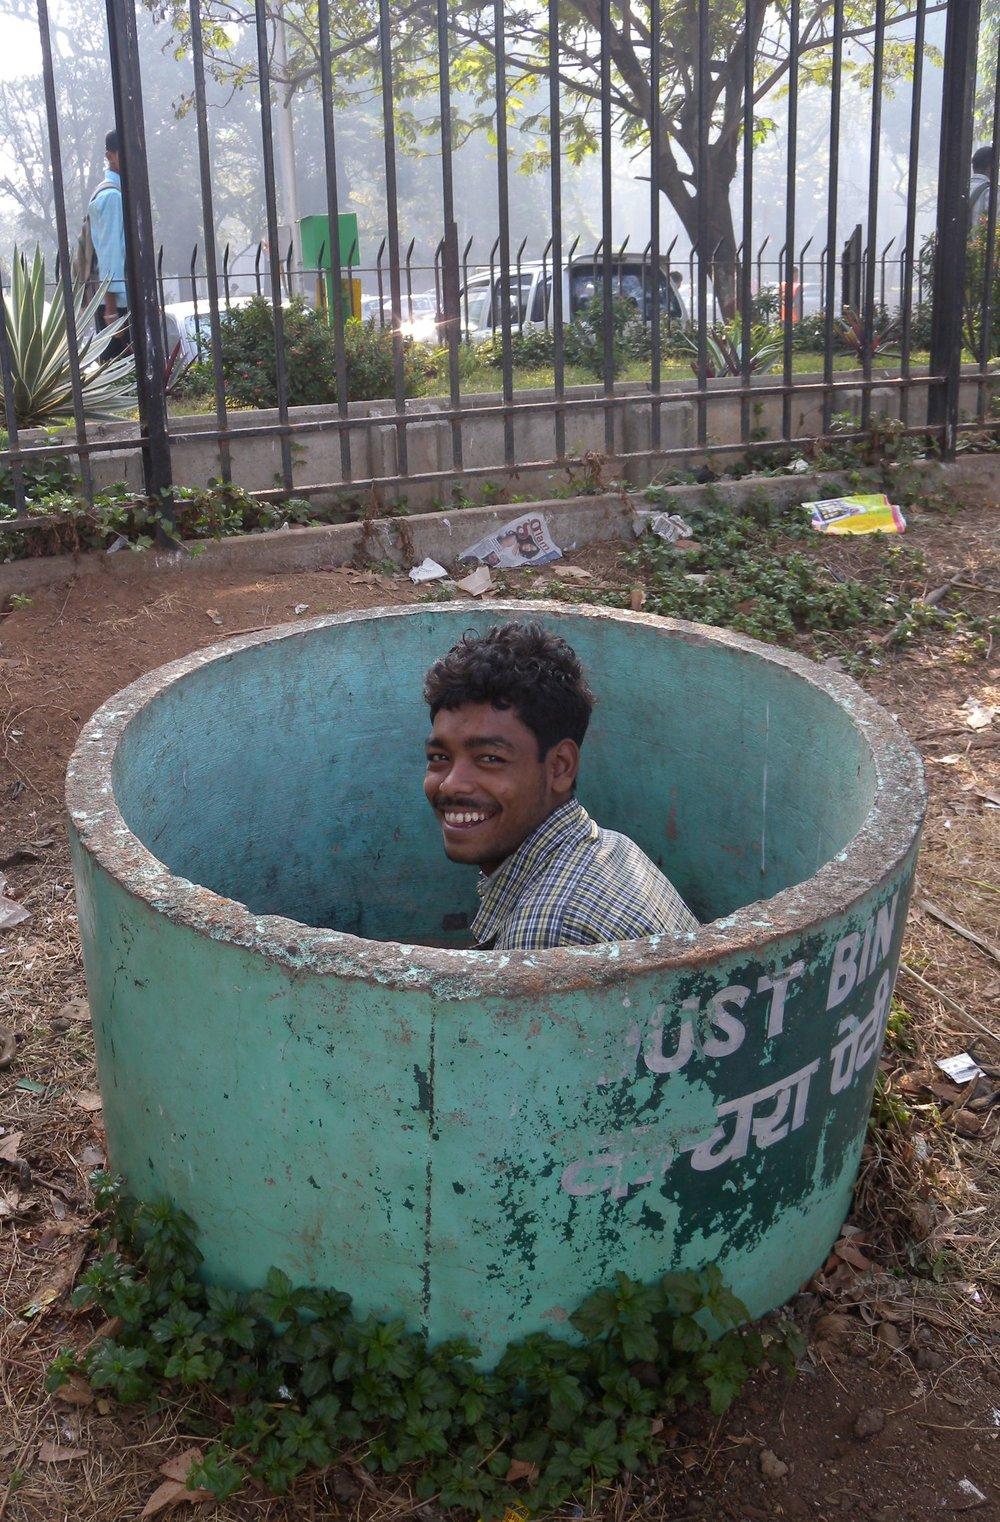 Mumbai - Bombay | Mumbaikar homeless smiling | ©sandrine cohen